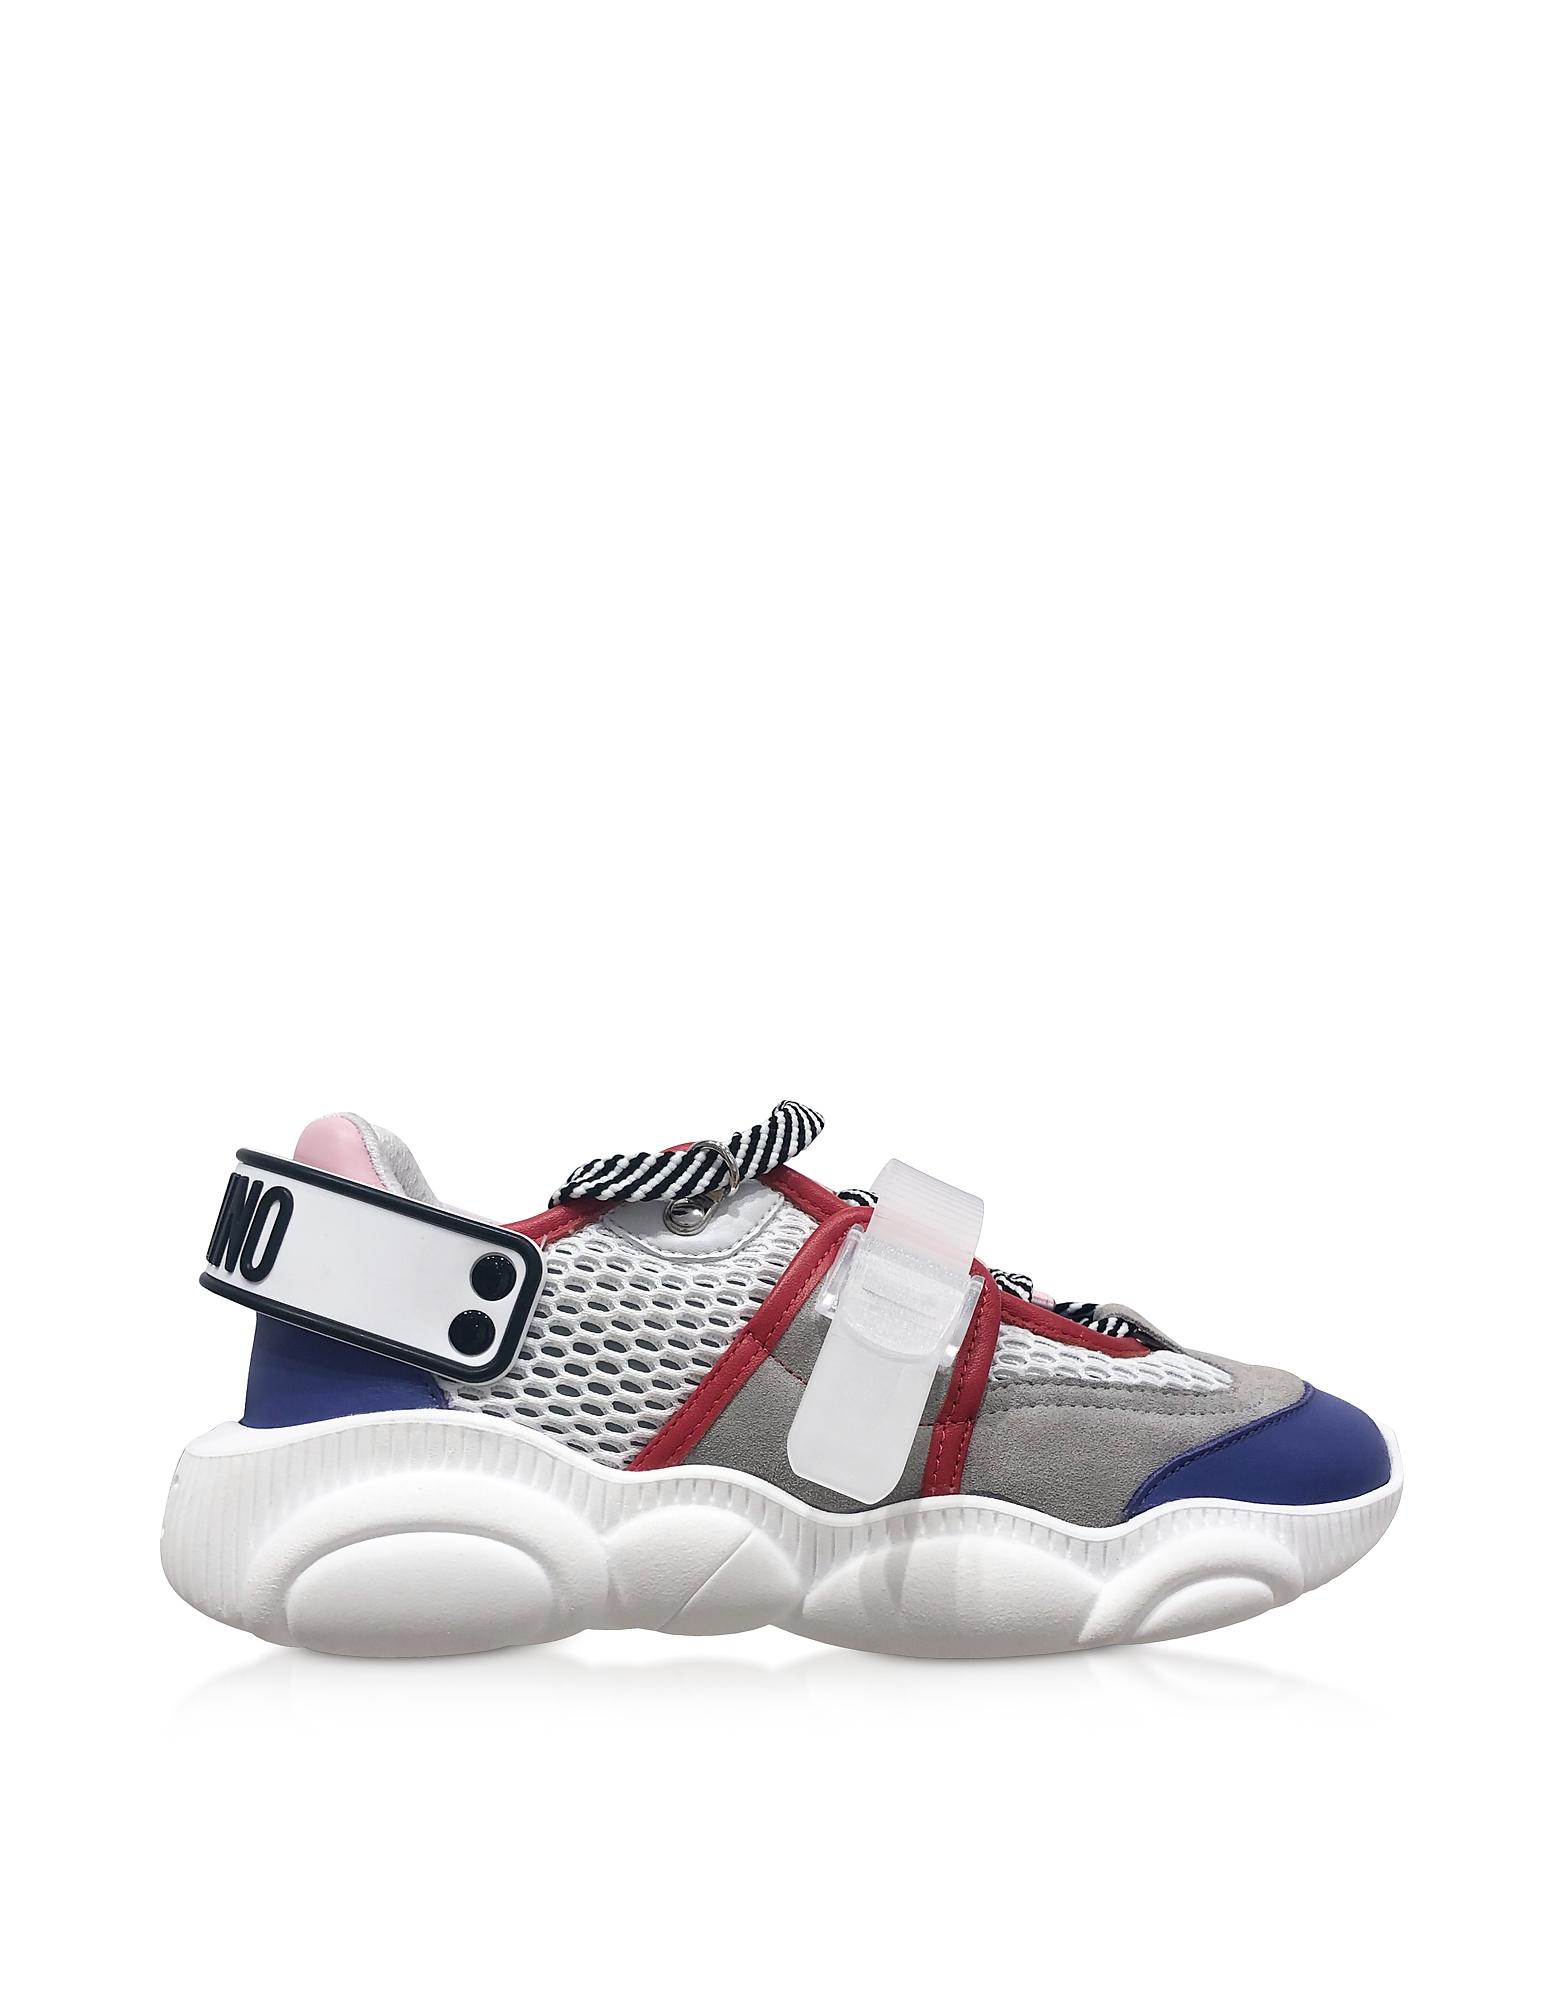 Signature Oversize Strap Women's Teddy Sneakers, White